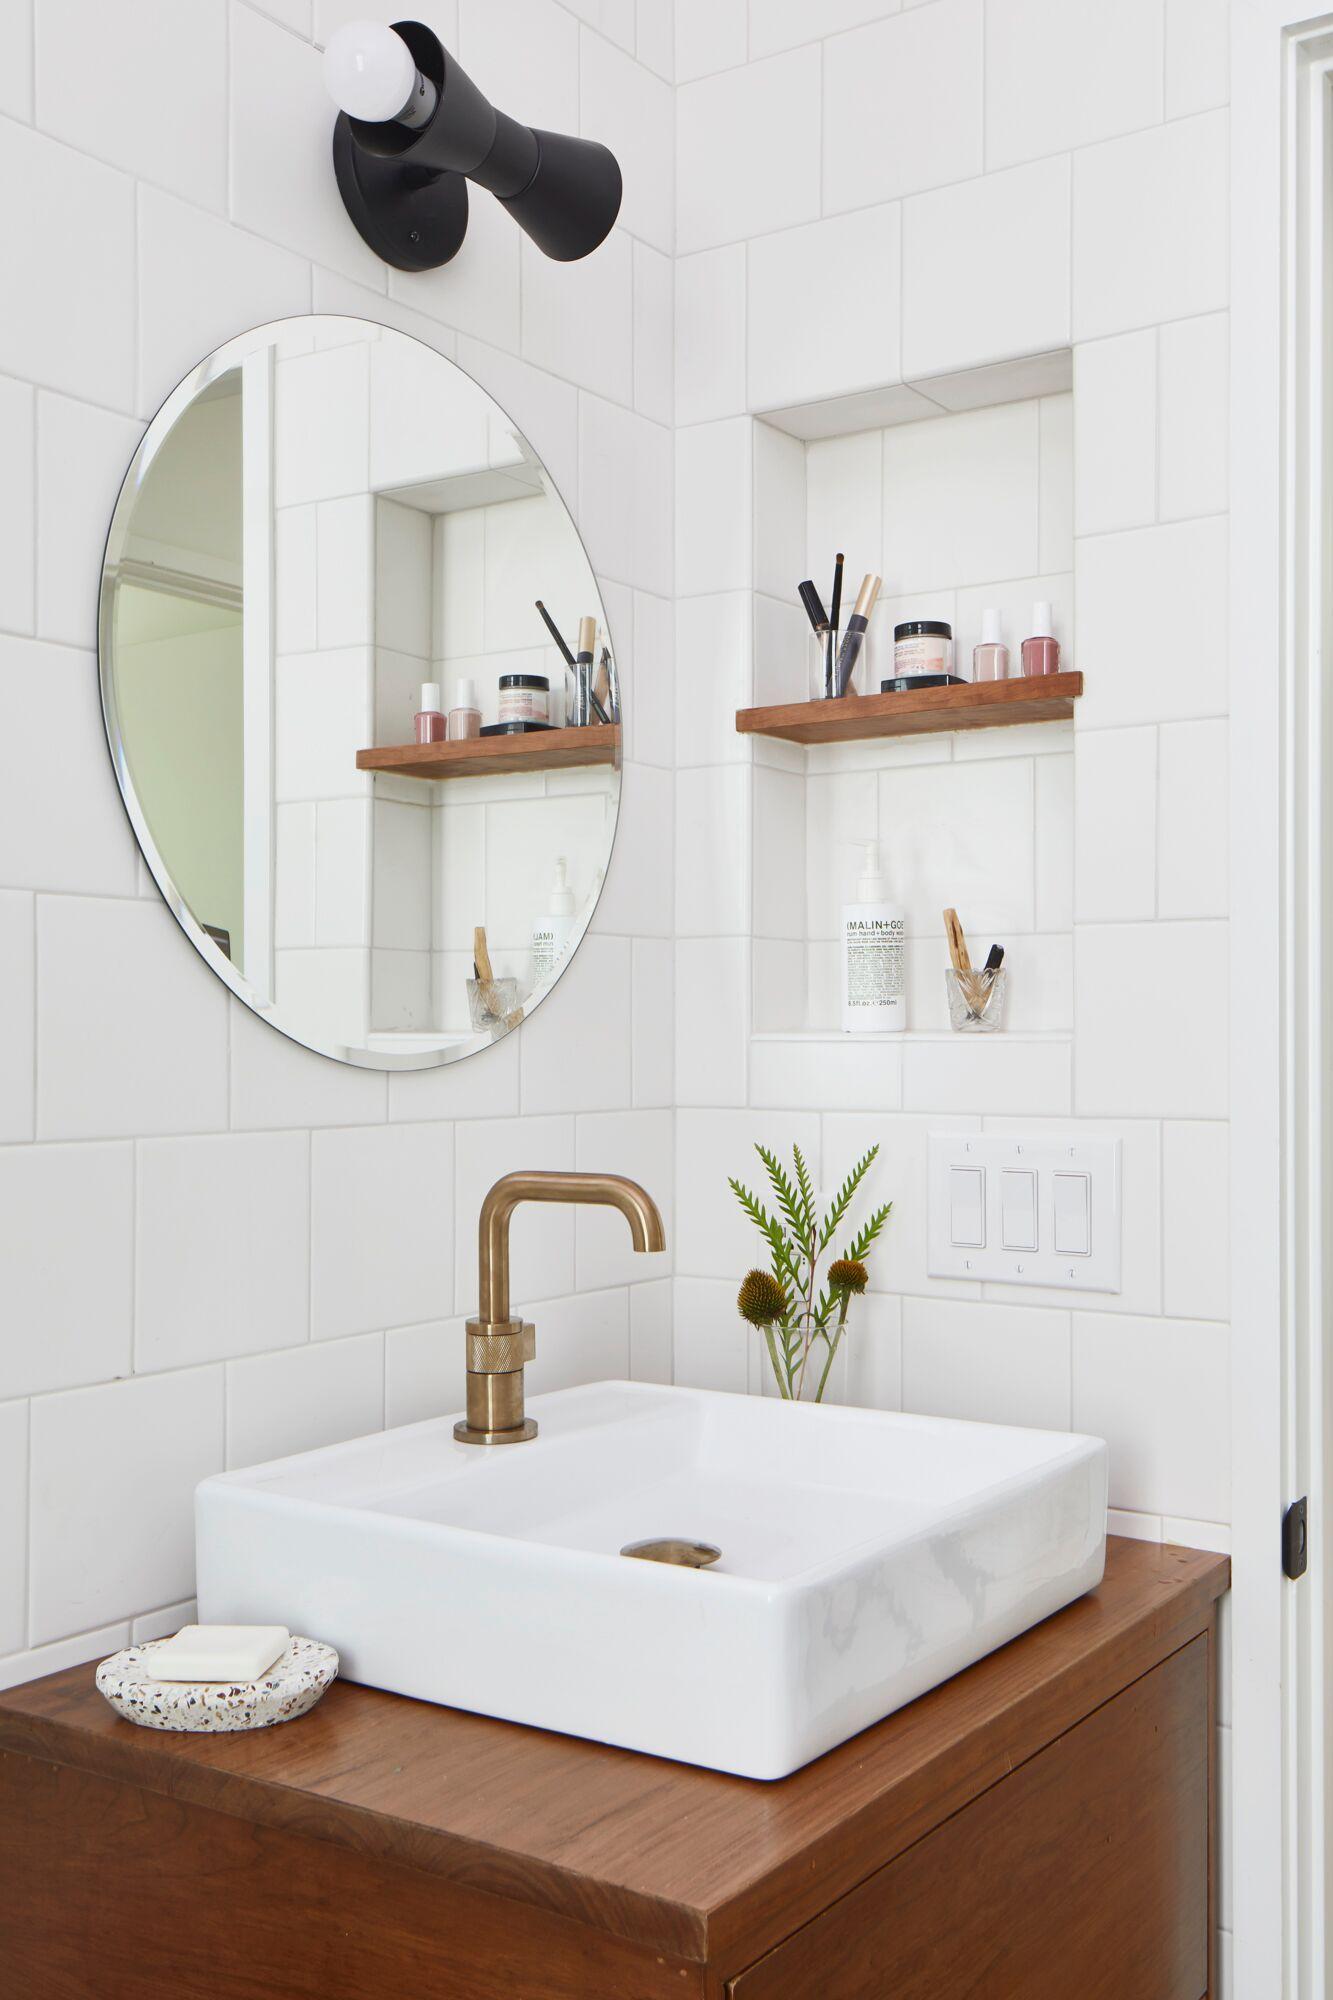 Vanity Niche Bathroom Mirror With Shelf Bathroom Inspiration Bathroom Niche [ 2000 x 1333 Pixel ]